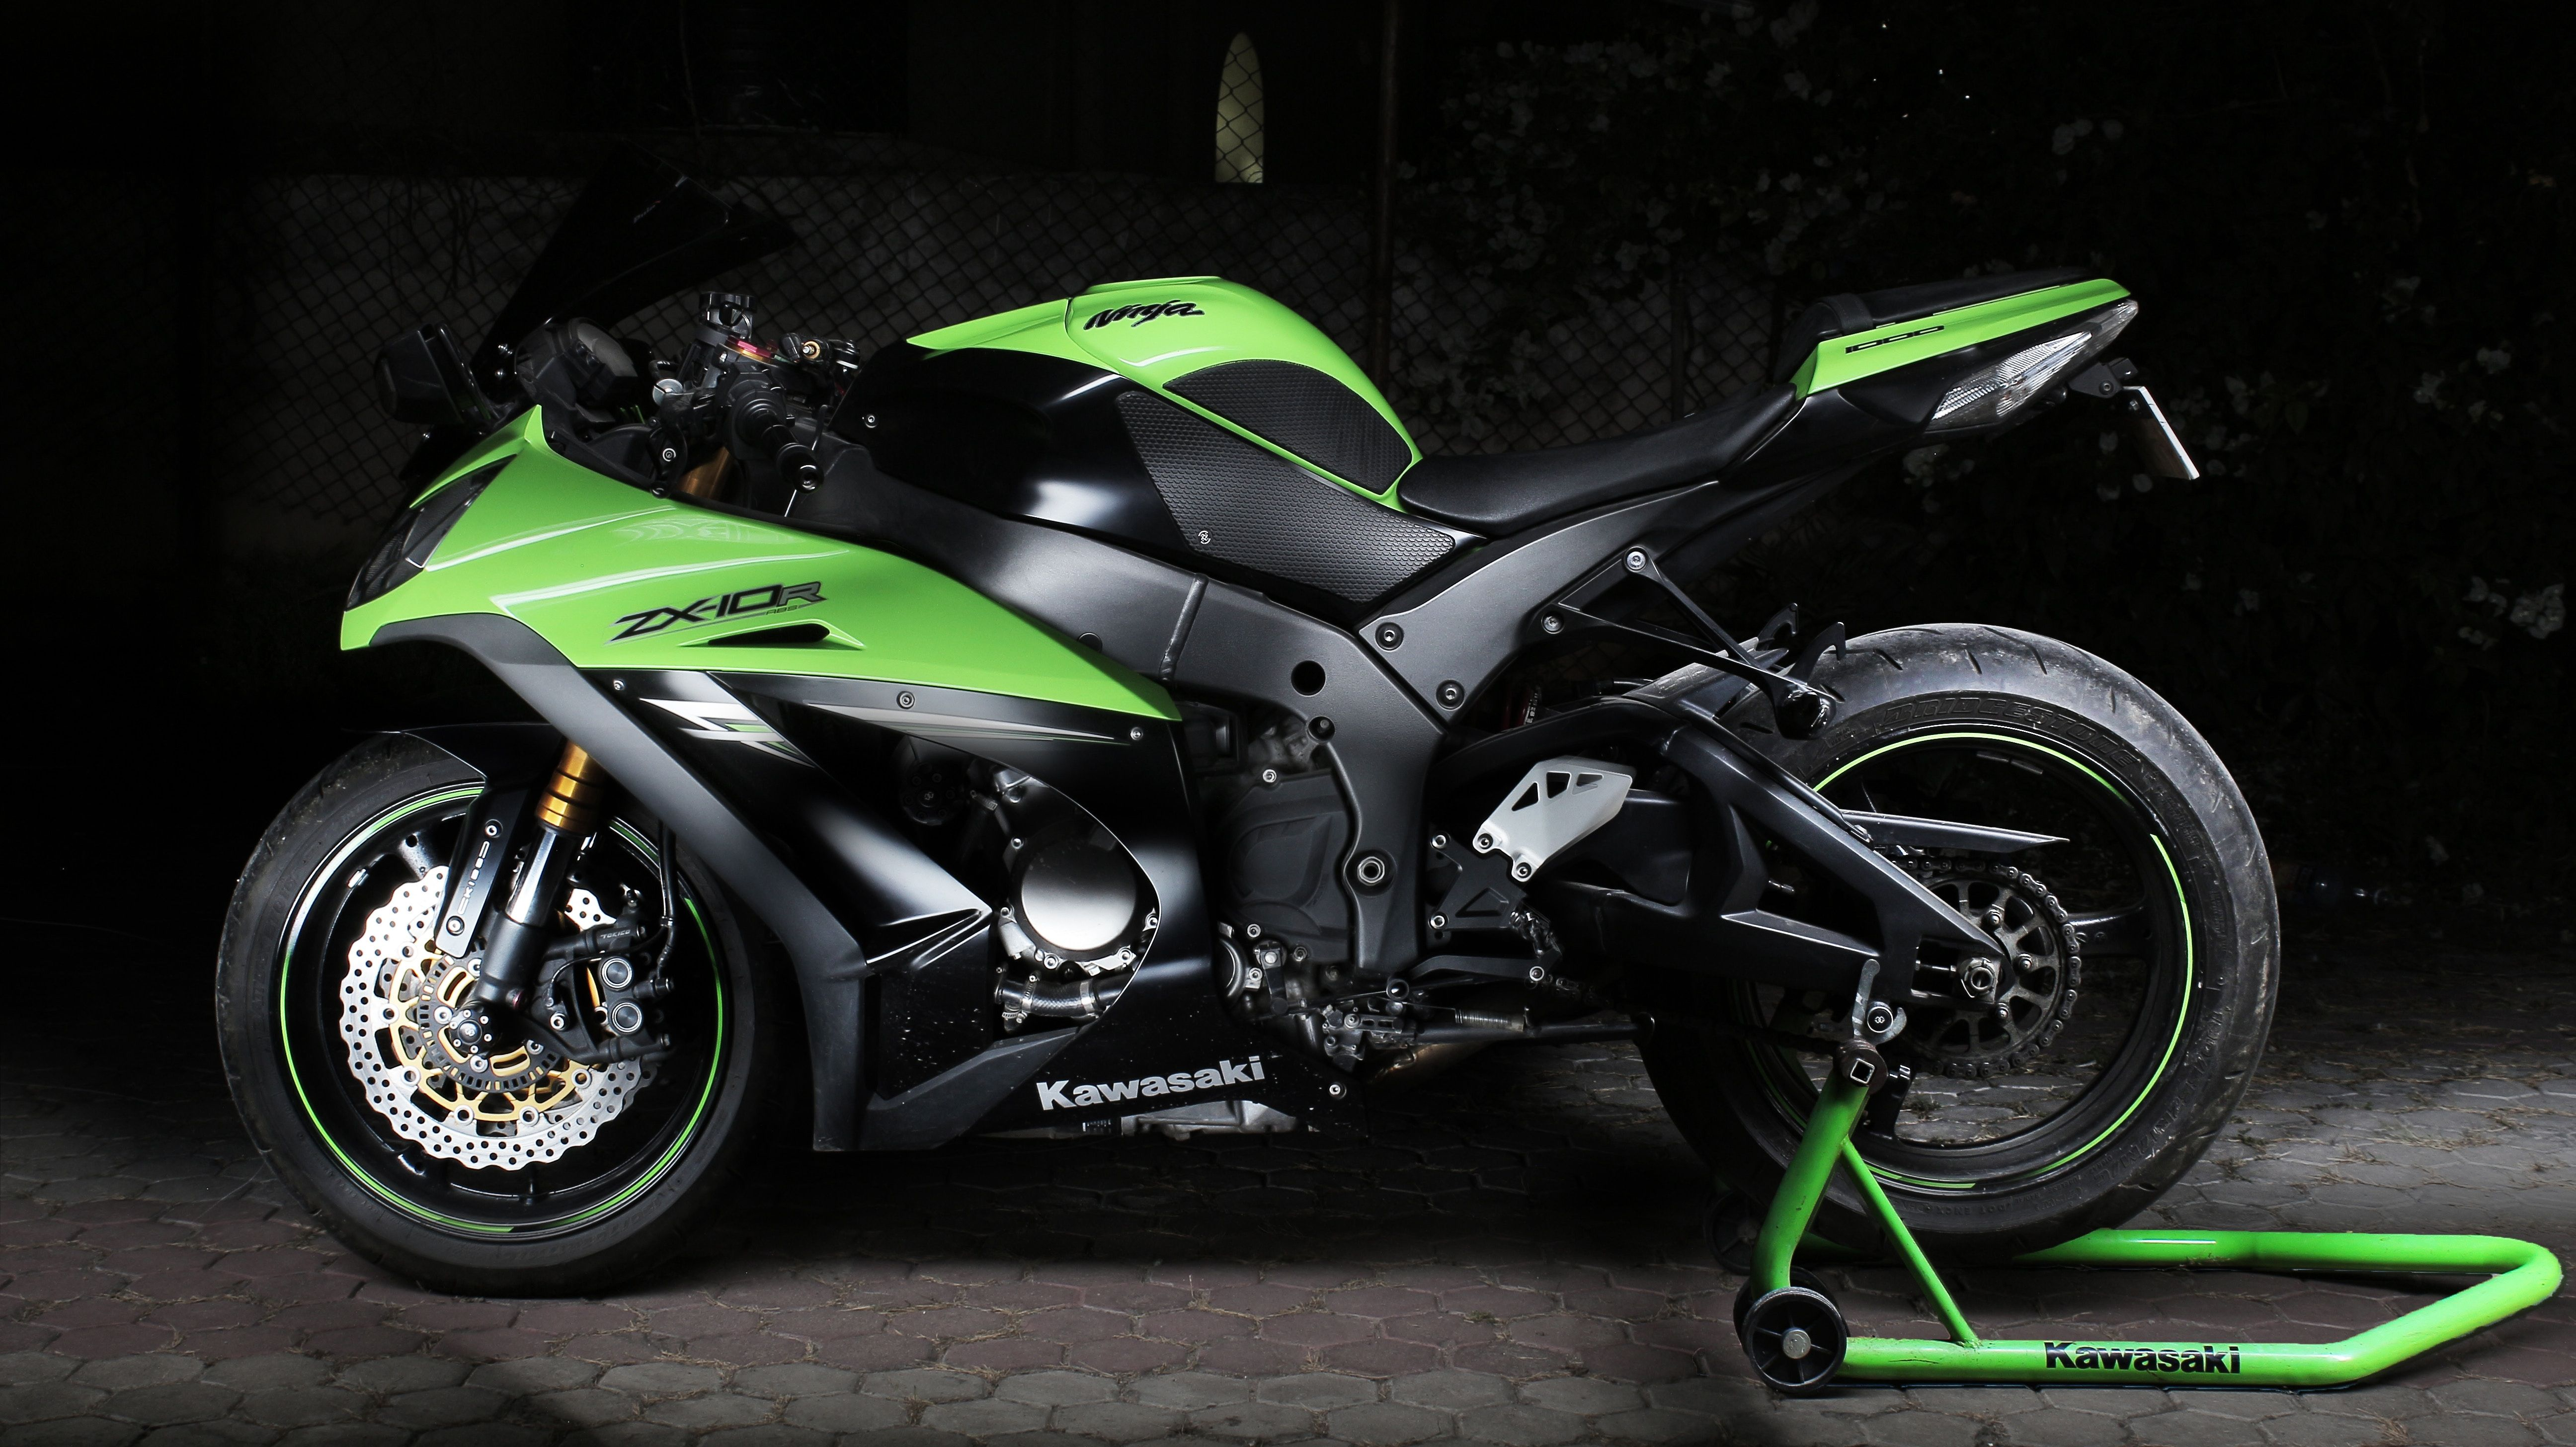 Cool motor new motorcycles motorcycle motorcycle wallpaper